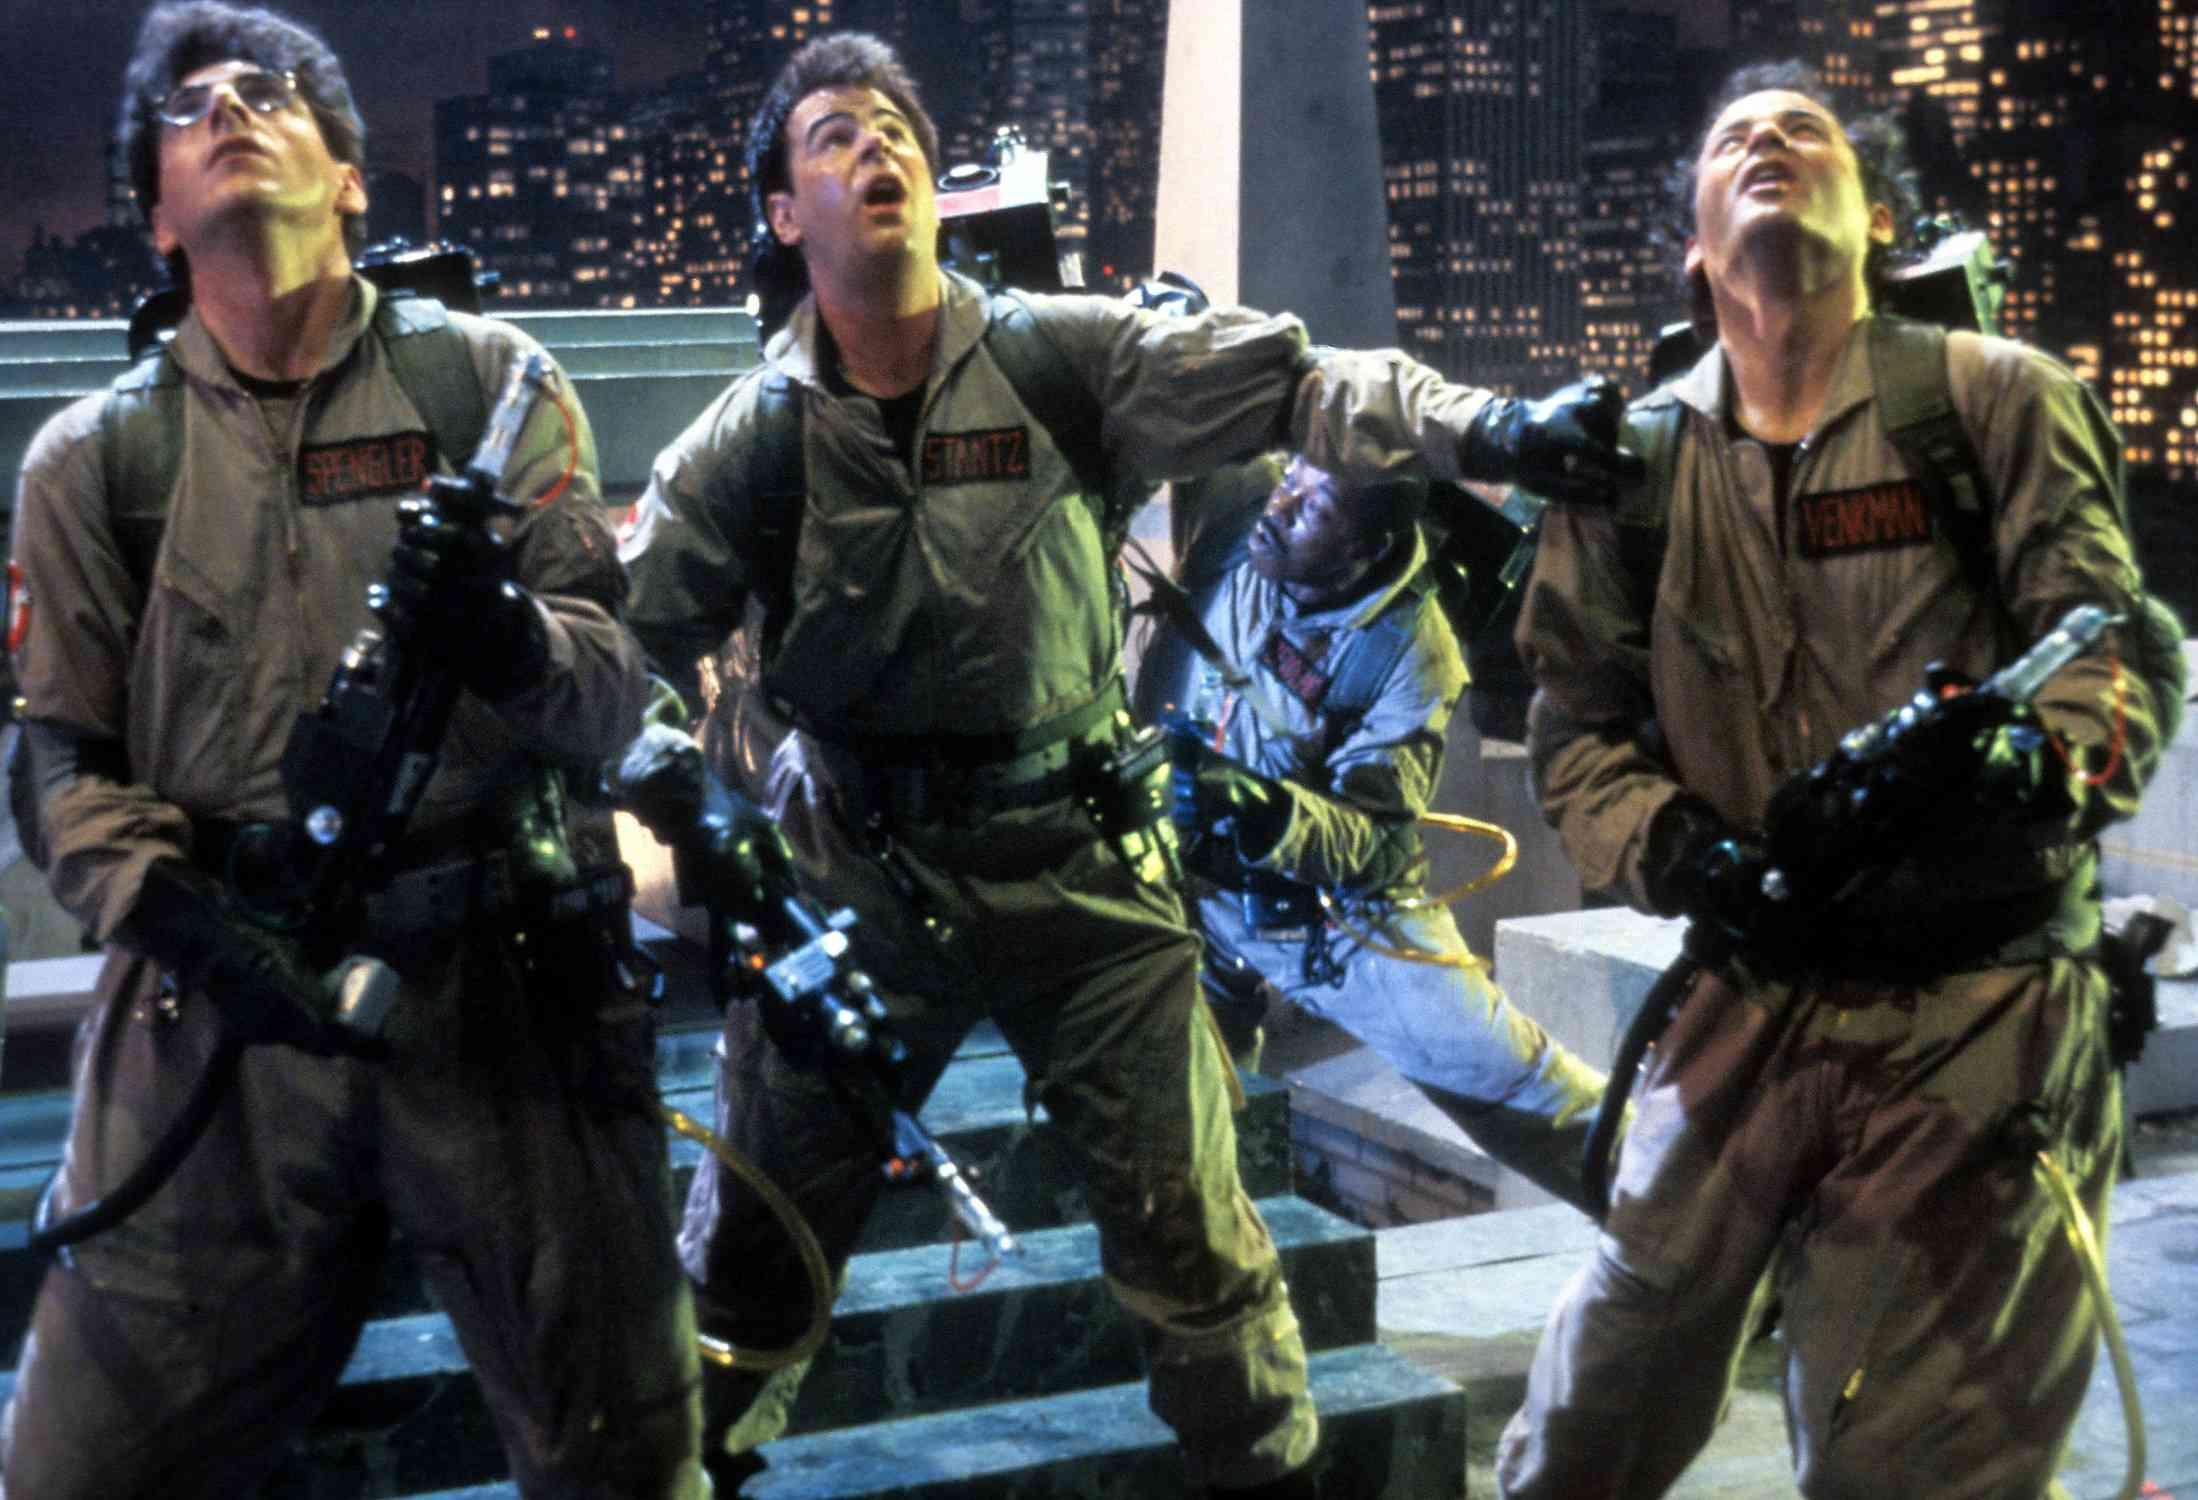 Harold Ramis, Dan Aykroyd and Bill Murray in a scene from Ghostbusters (1984)